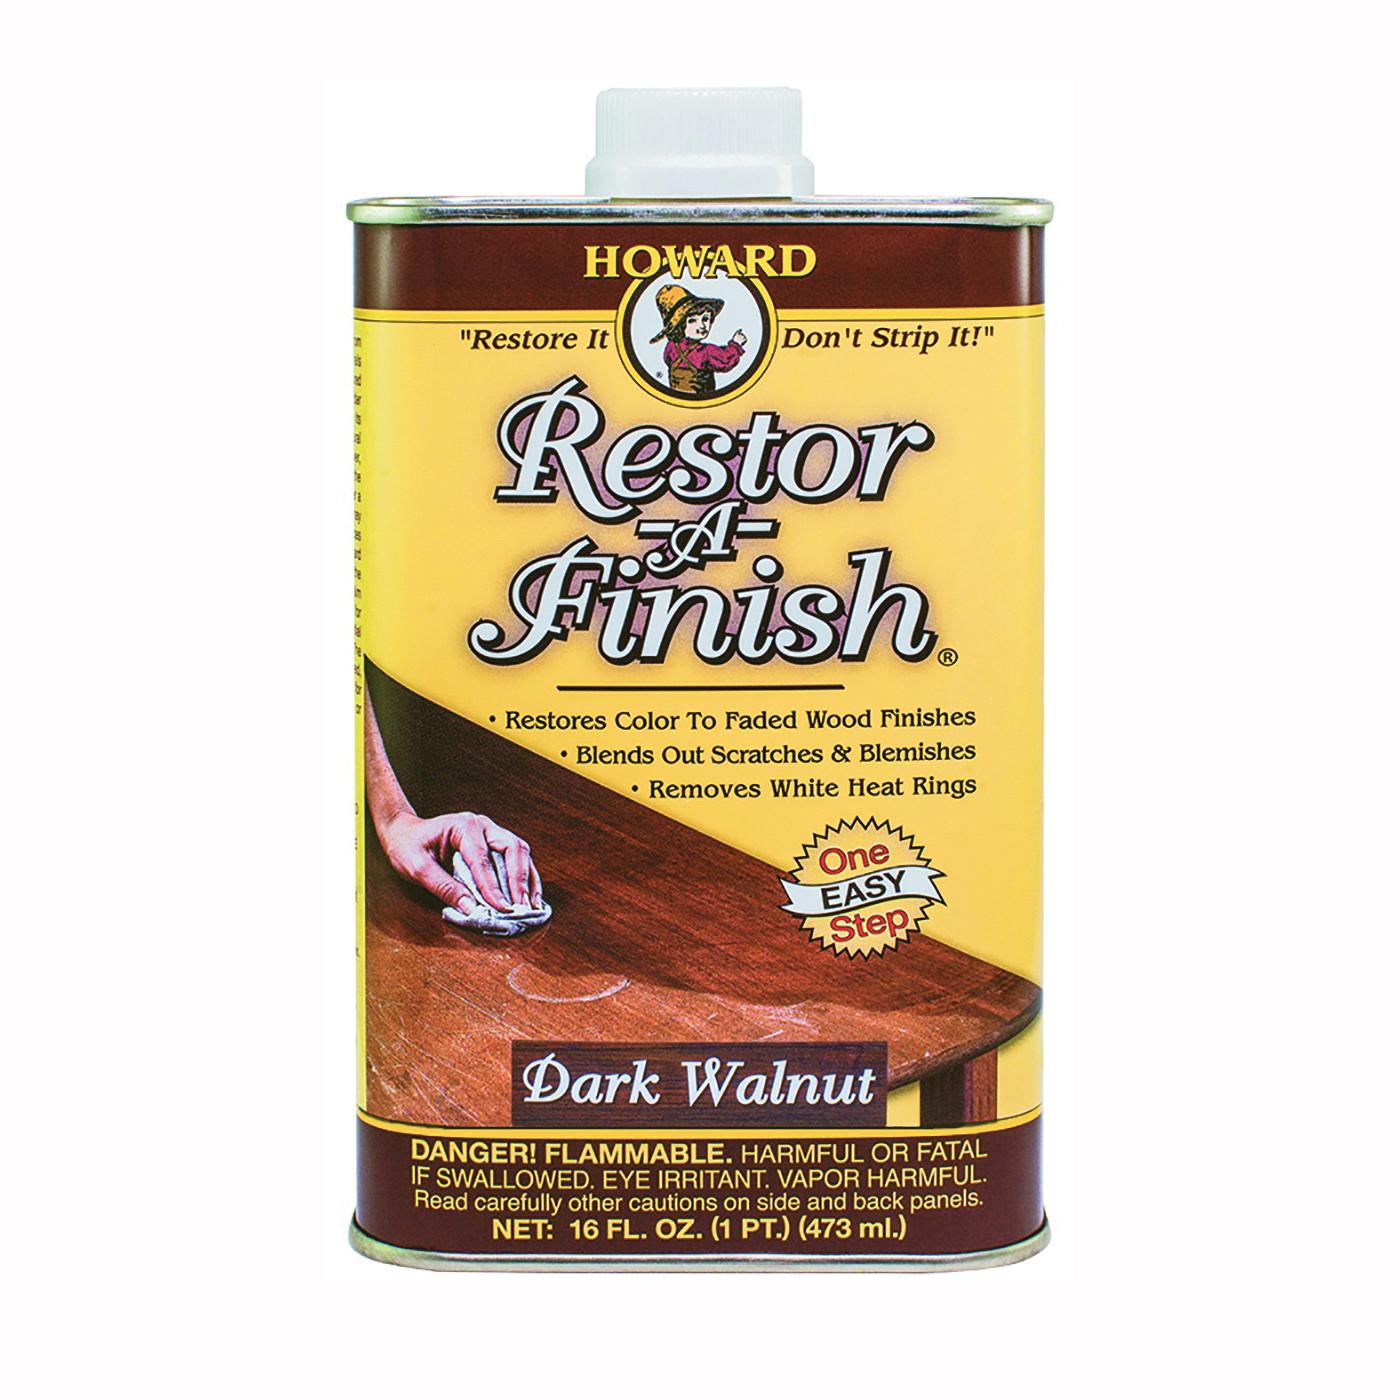 Picture of HOWARD RF6016 Wood Restorer, Dark Walnut, Liquid, 16 oz, Can